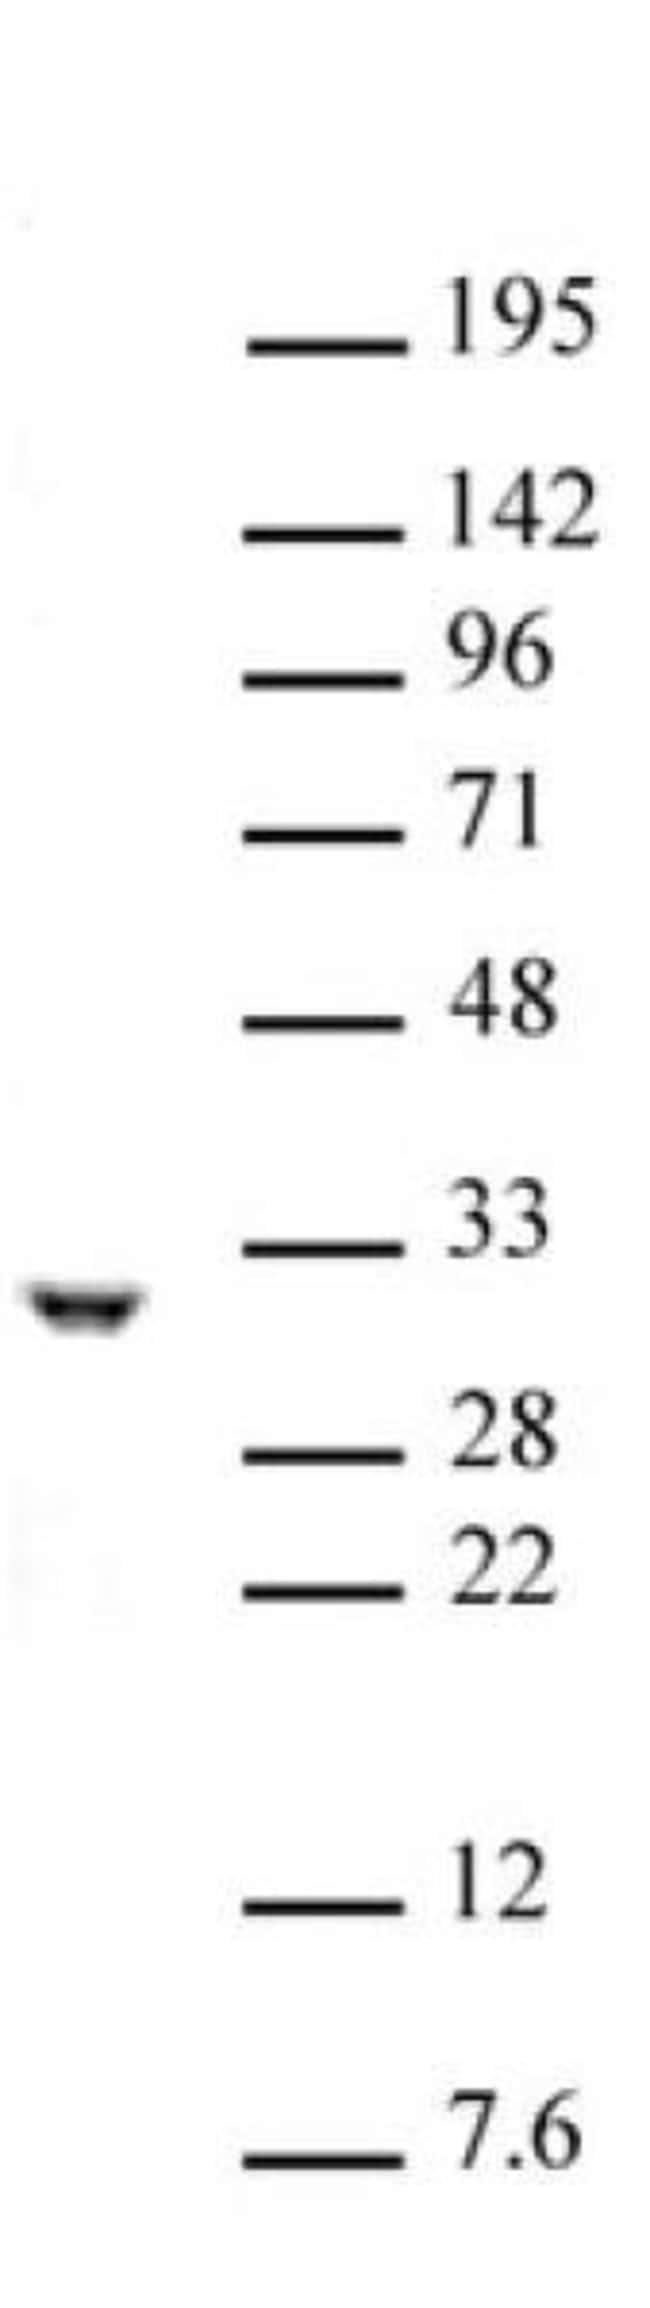 PHB / Prohibitin Rabbit anti-Human, Unconjugated, Polyclonal, Active Motif:Antibodies:Primary